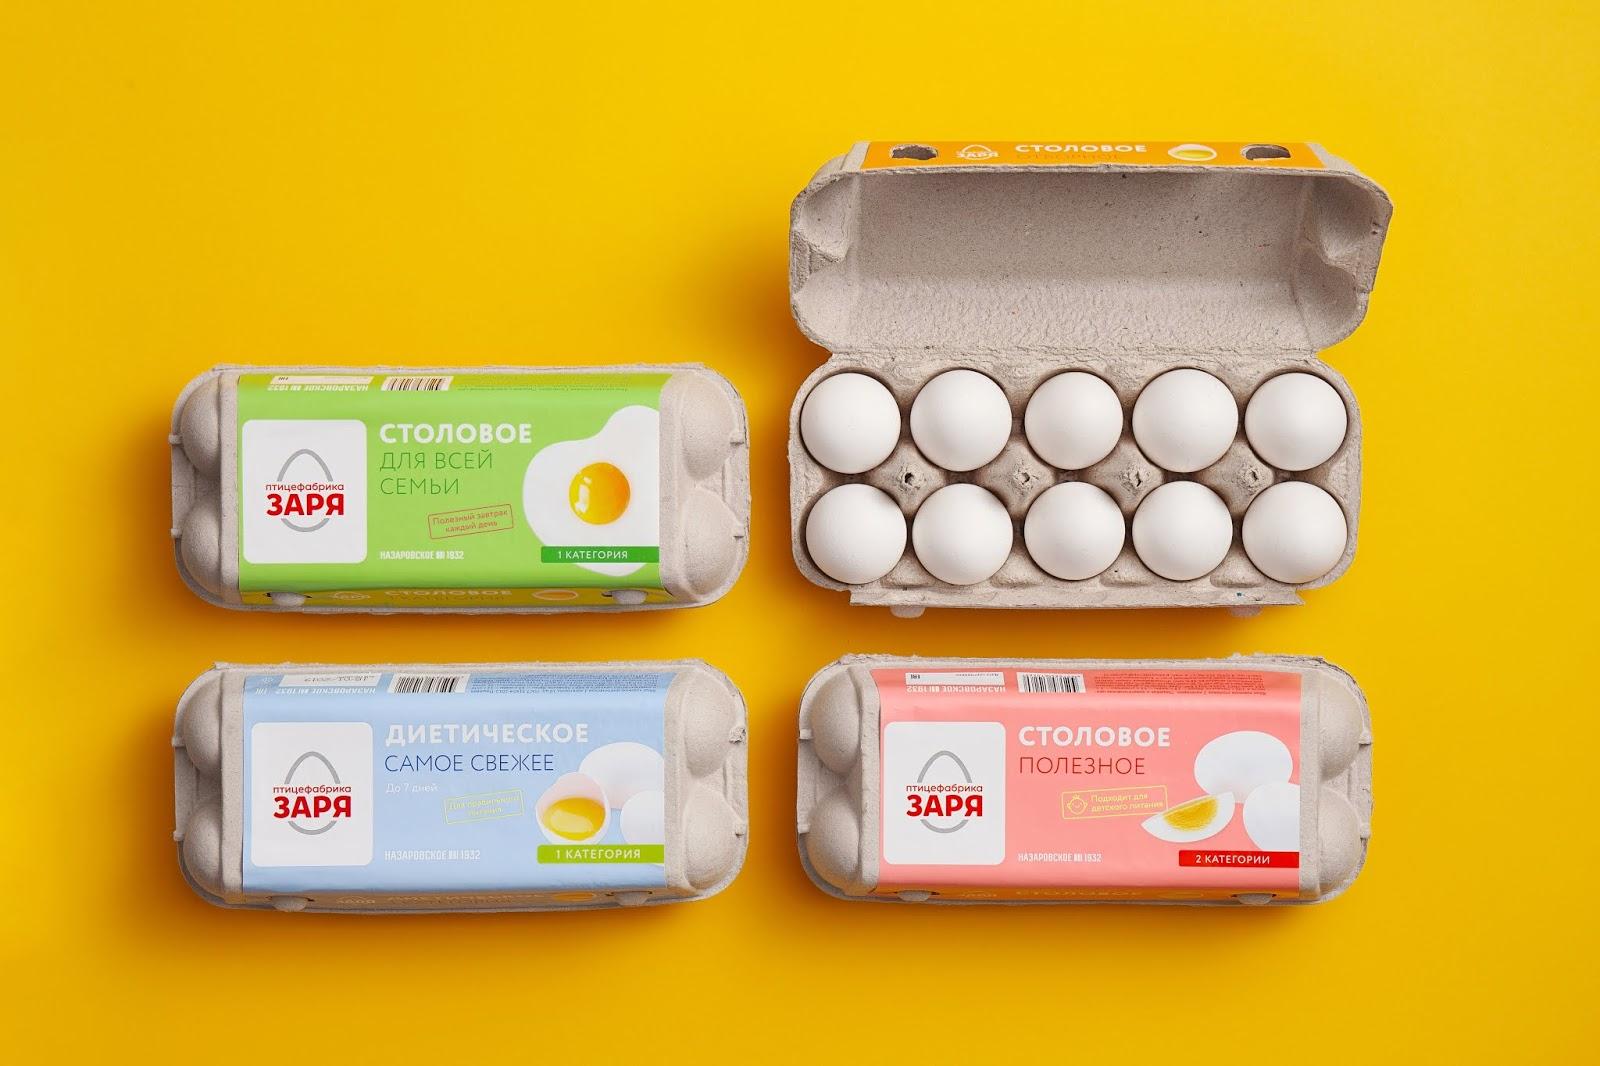 zarya-eggs-蛋包装盒3